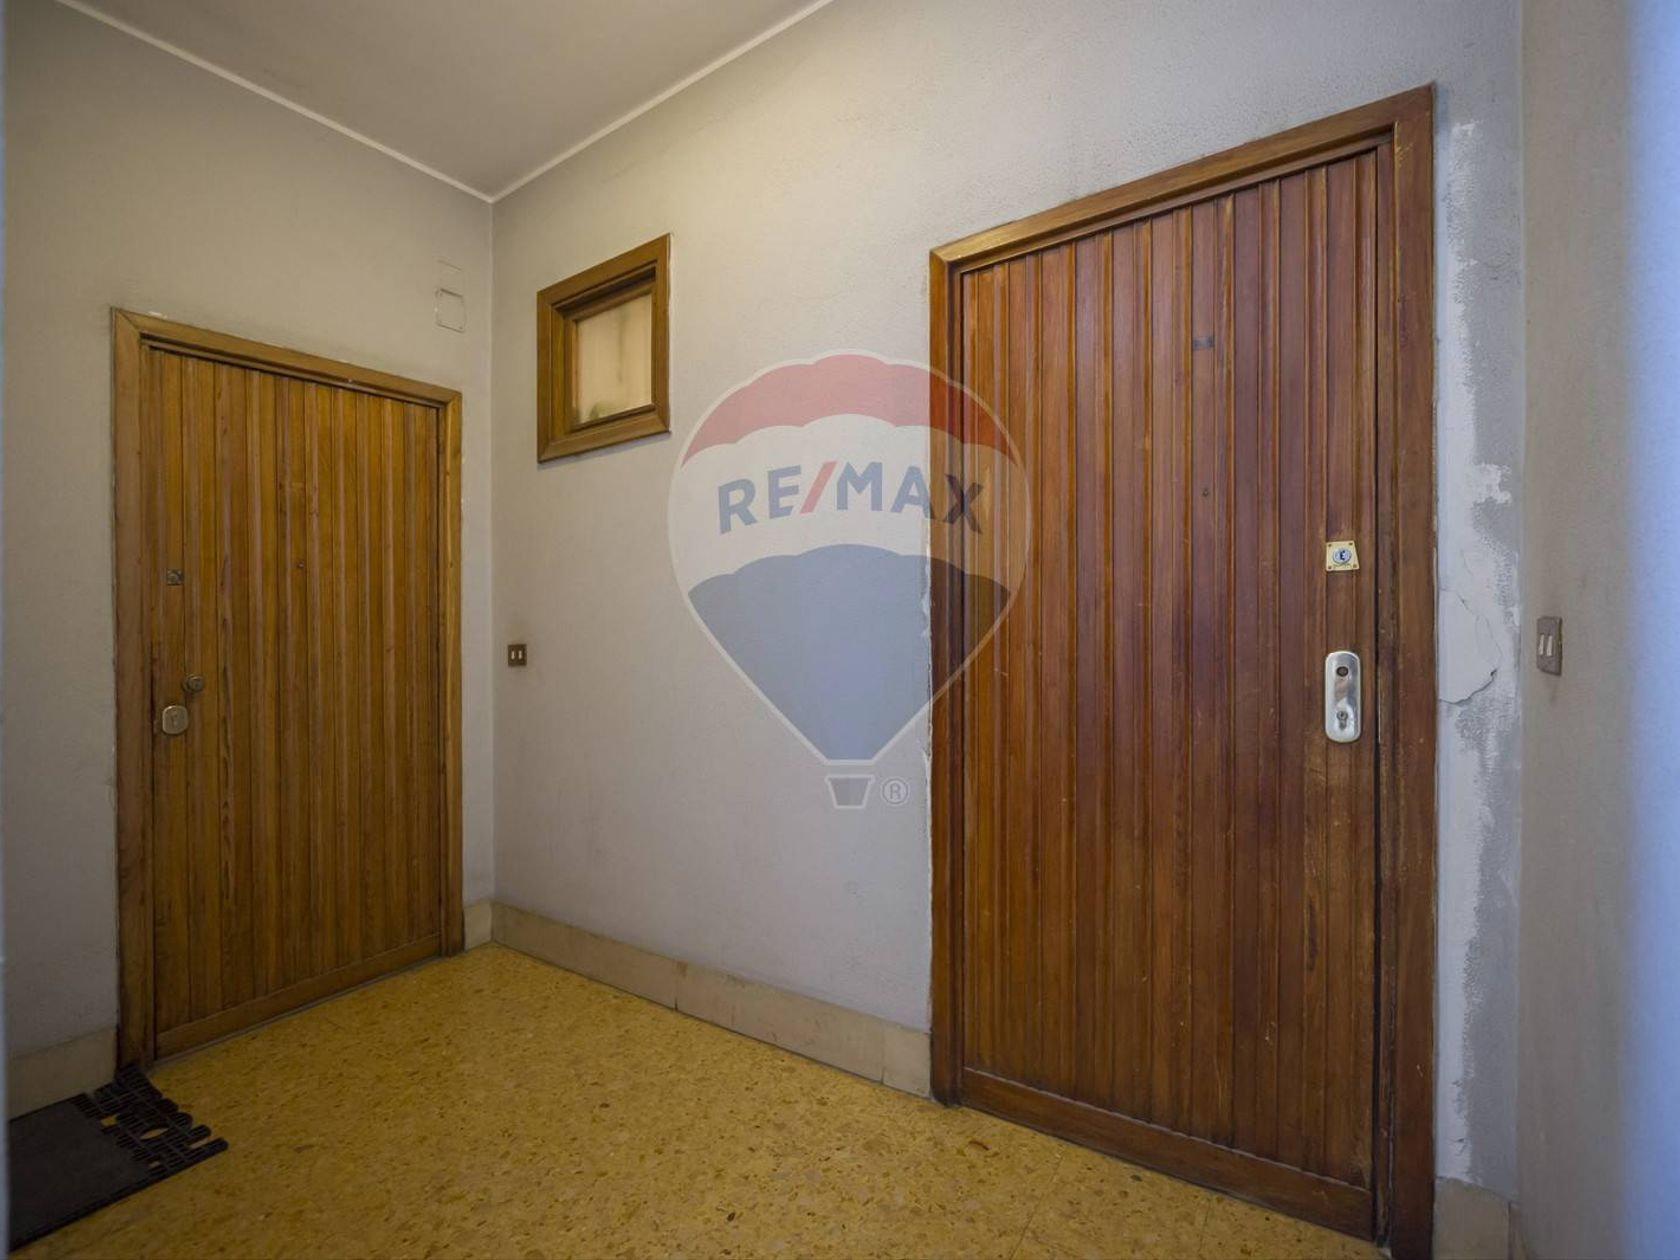 Appartamento Porta Nuova, Pescara, PE Vendita - Foto 21